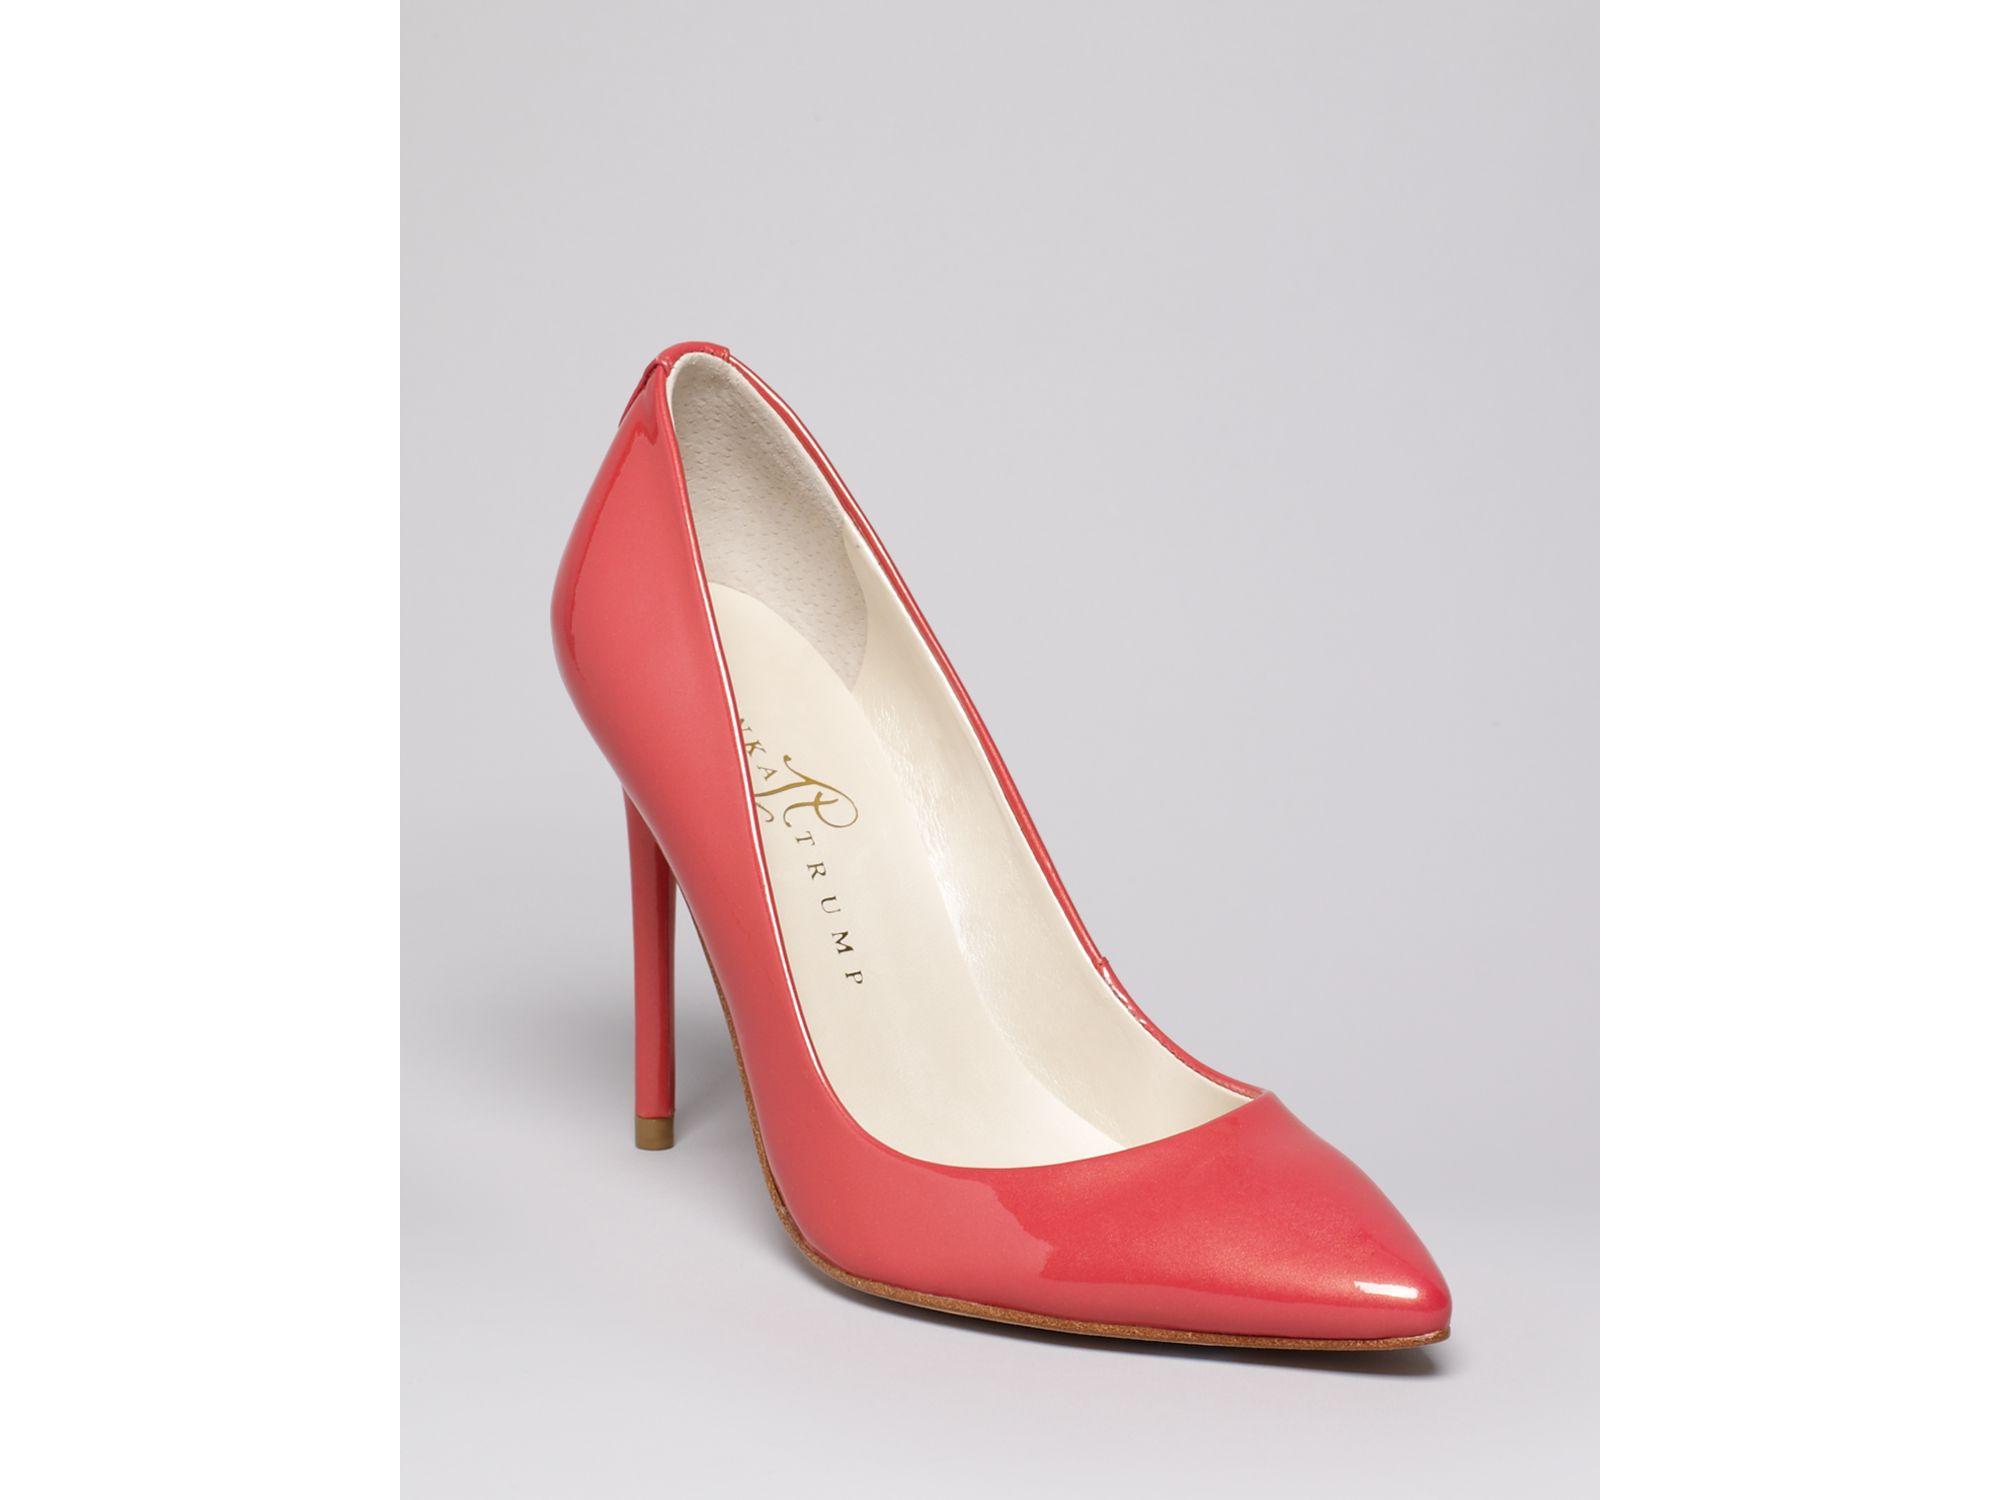 Lyst - Ivanka trump Pointed Toe Pumps Kayden3 High Heel in Pink